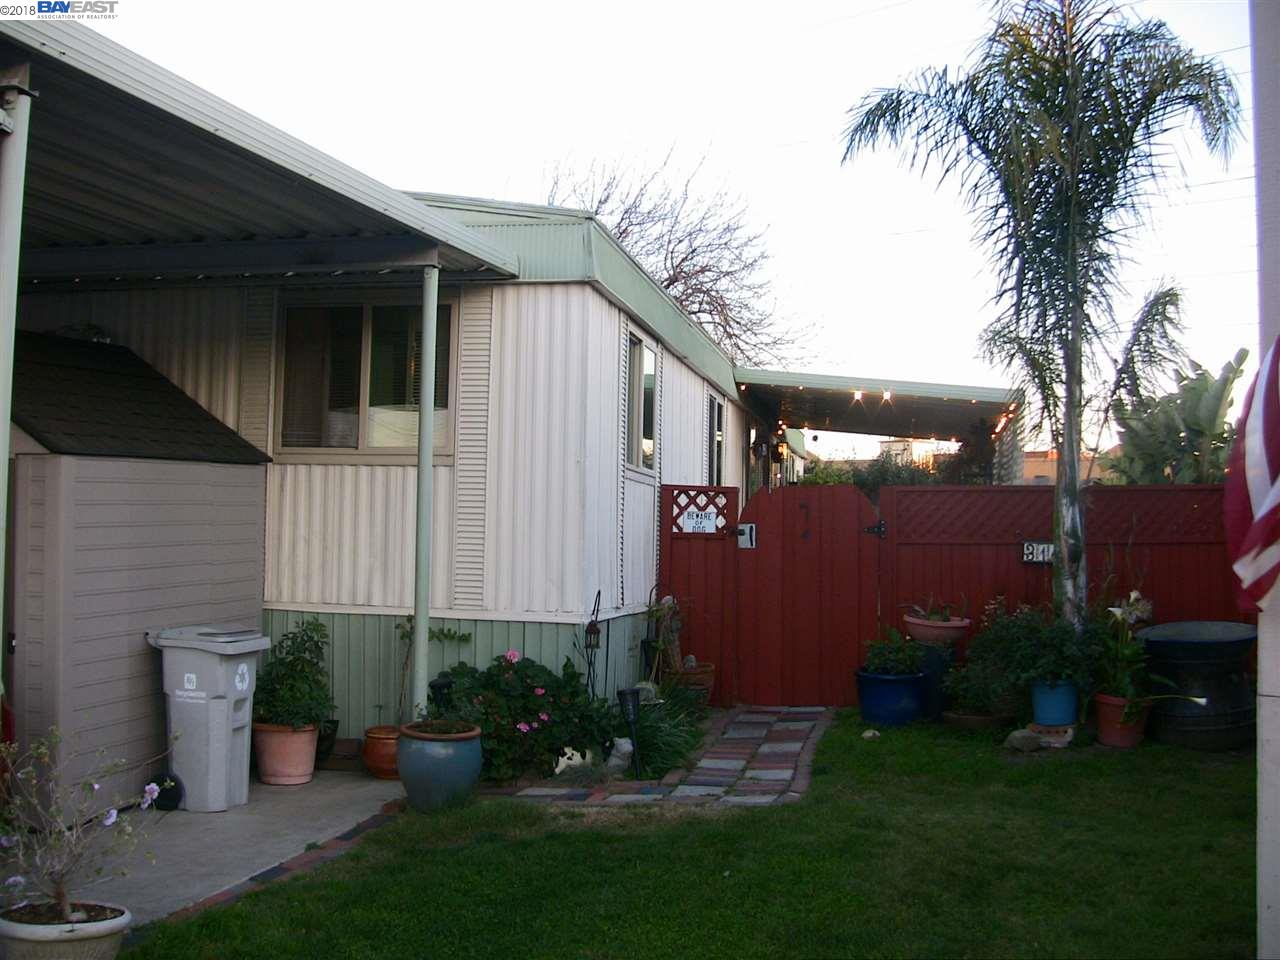 314 WINNIPEG GREEN, FREMONT, CA 94538